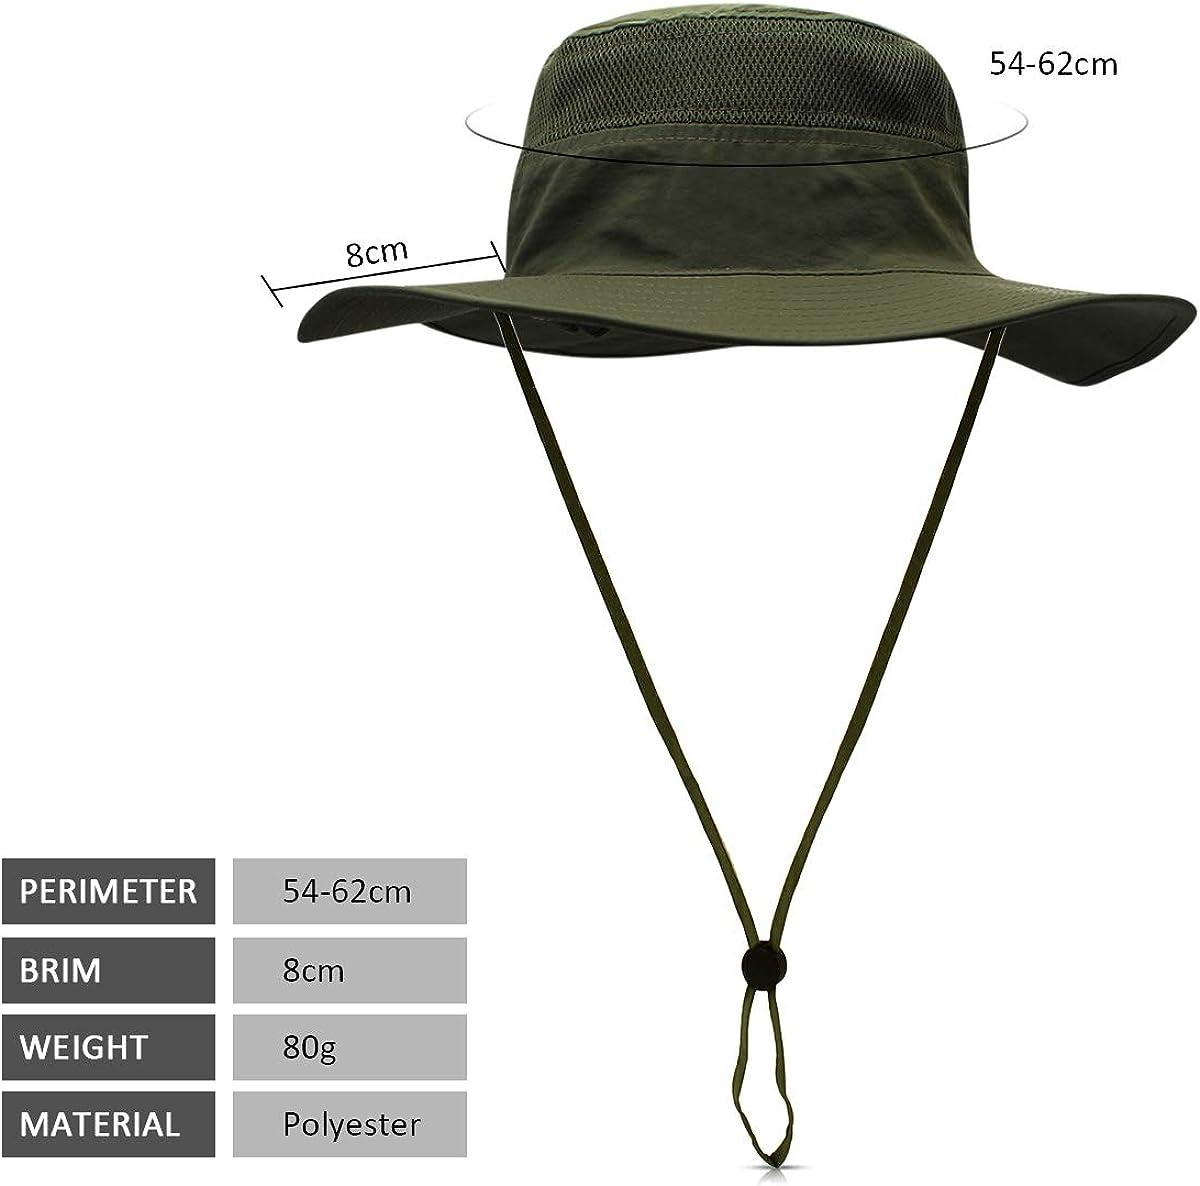 DORRISO Unisex Sun Hat Wide Brimmed Bucket Hat UPF 50 Foldable Vacation Traveling Mountaineering Beach Bush Hat Waterproof Polyester Men Womens Fisherman Cap